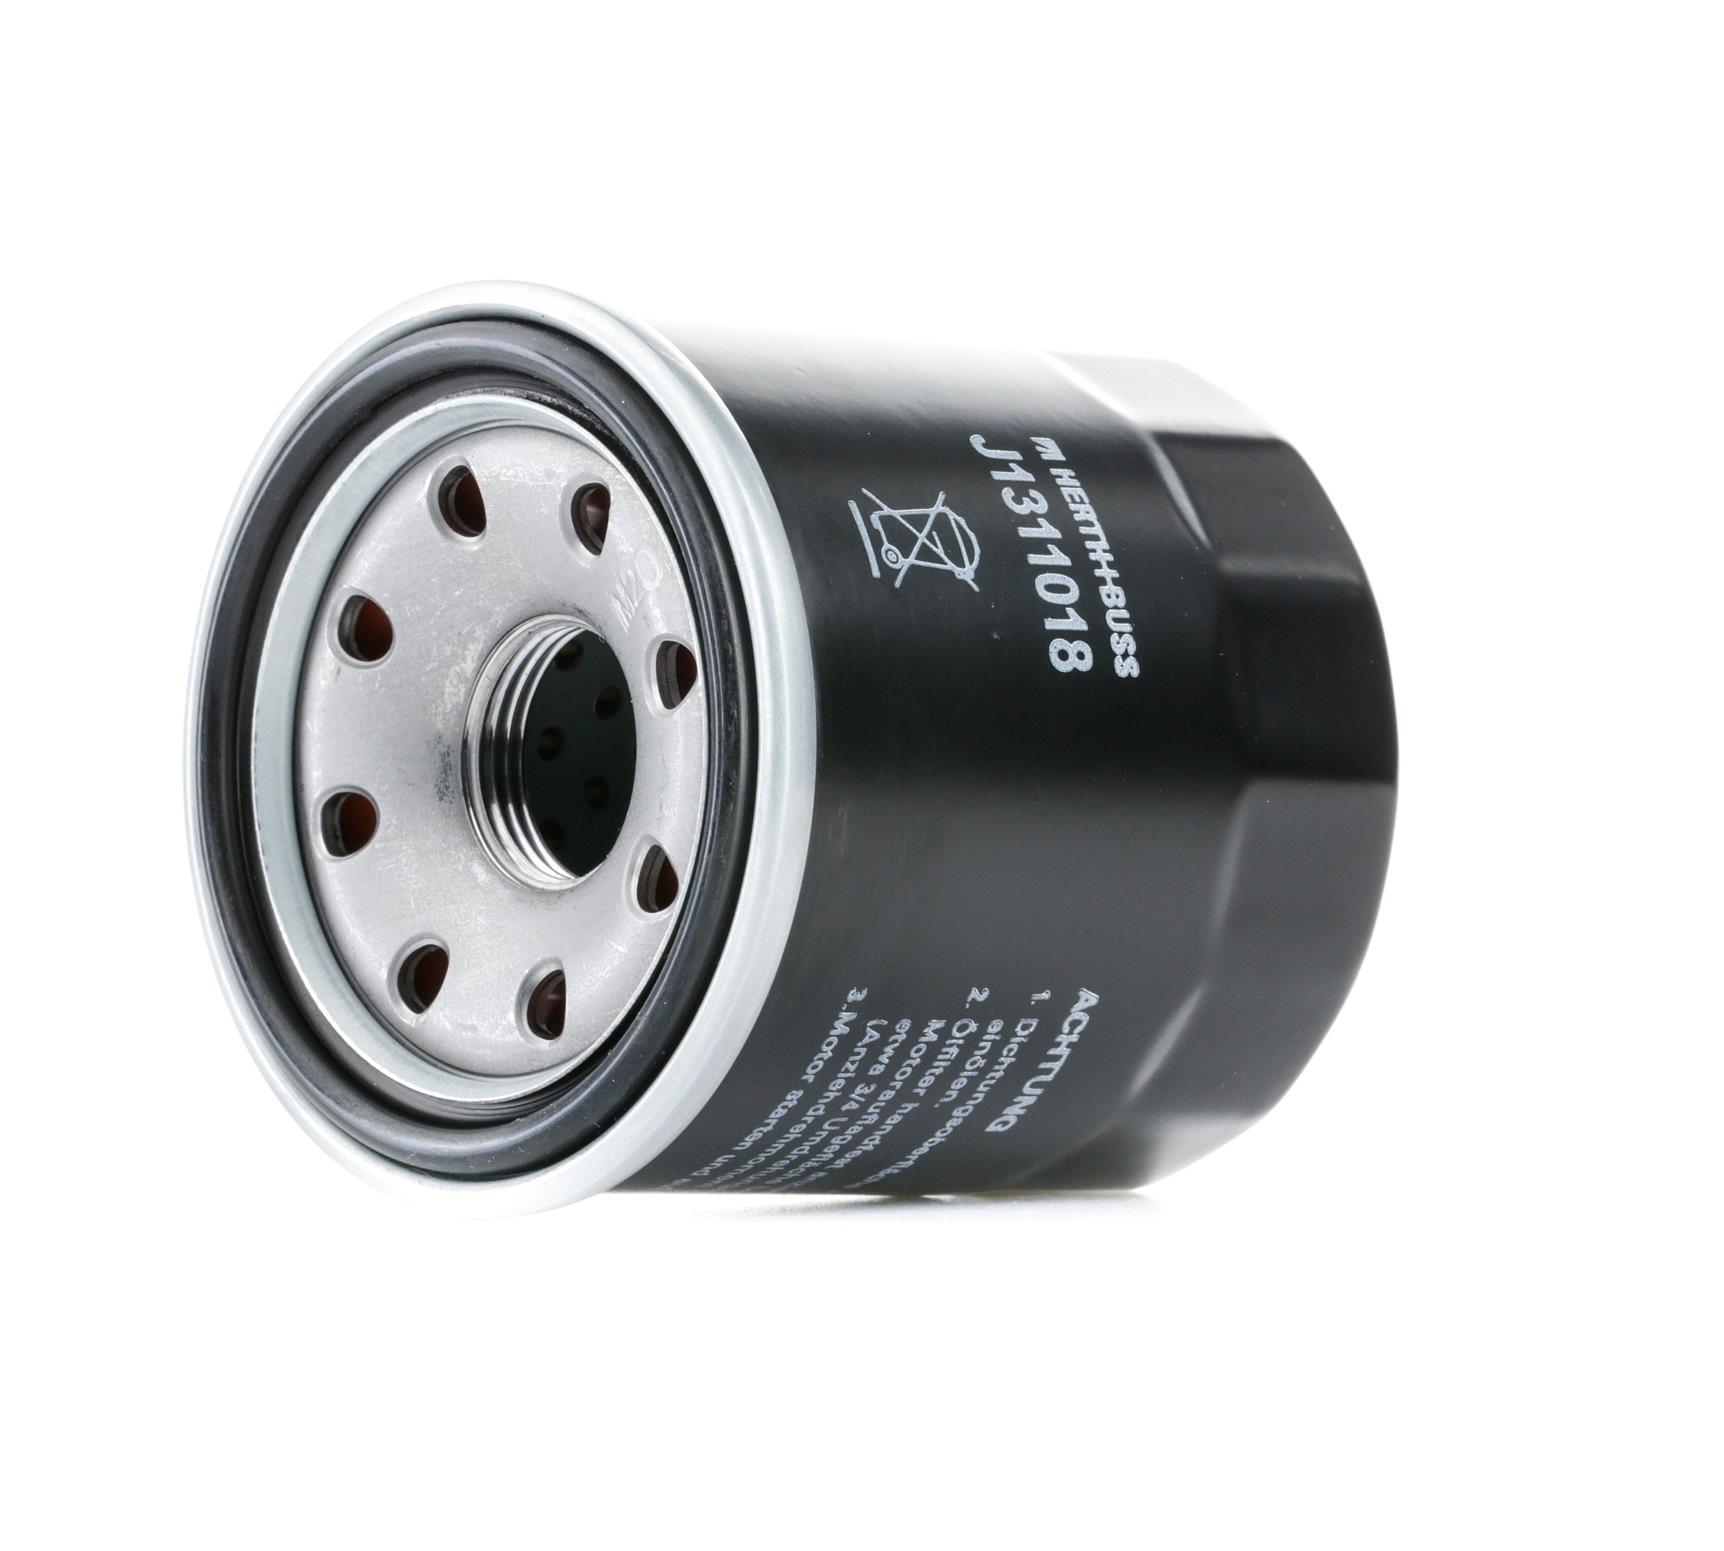 INFINITI EX 2017 Motorölfilter - Original HERTH+BUSS JAKOPARTS J1311018 Ø: 66mm, Länge: 70mm, Länge: 70mm